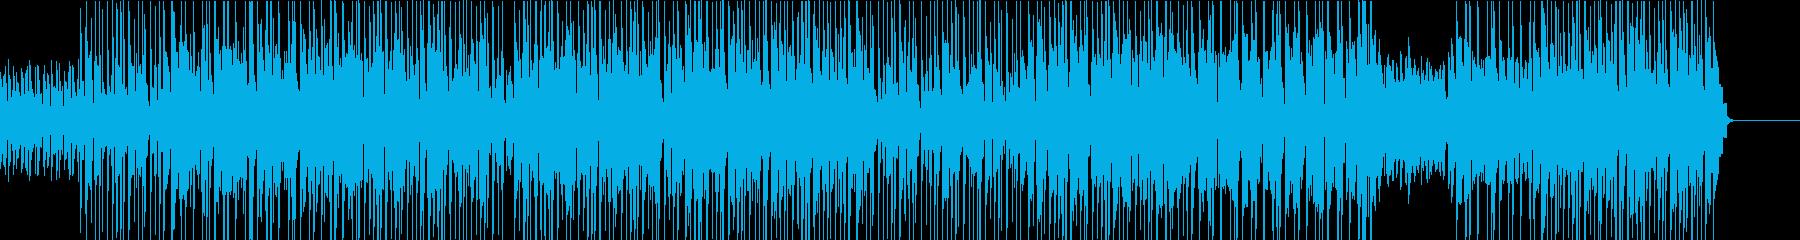 SUNNY NEW DAYSの再生済みの波形